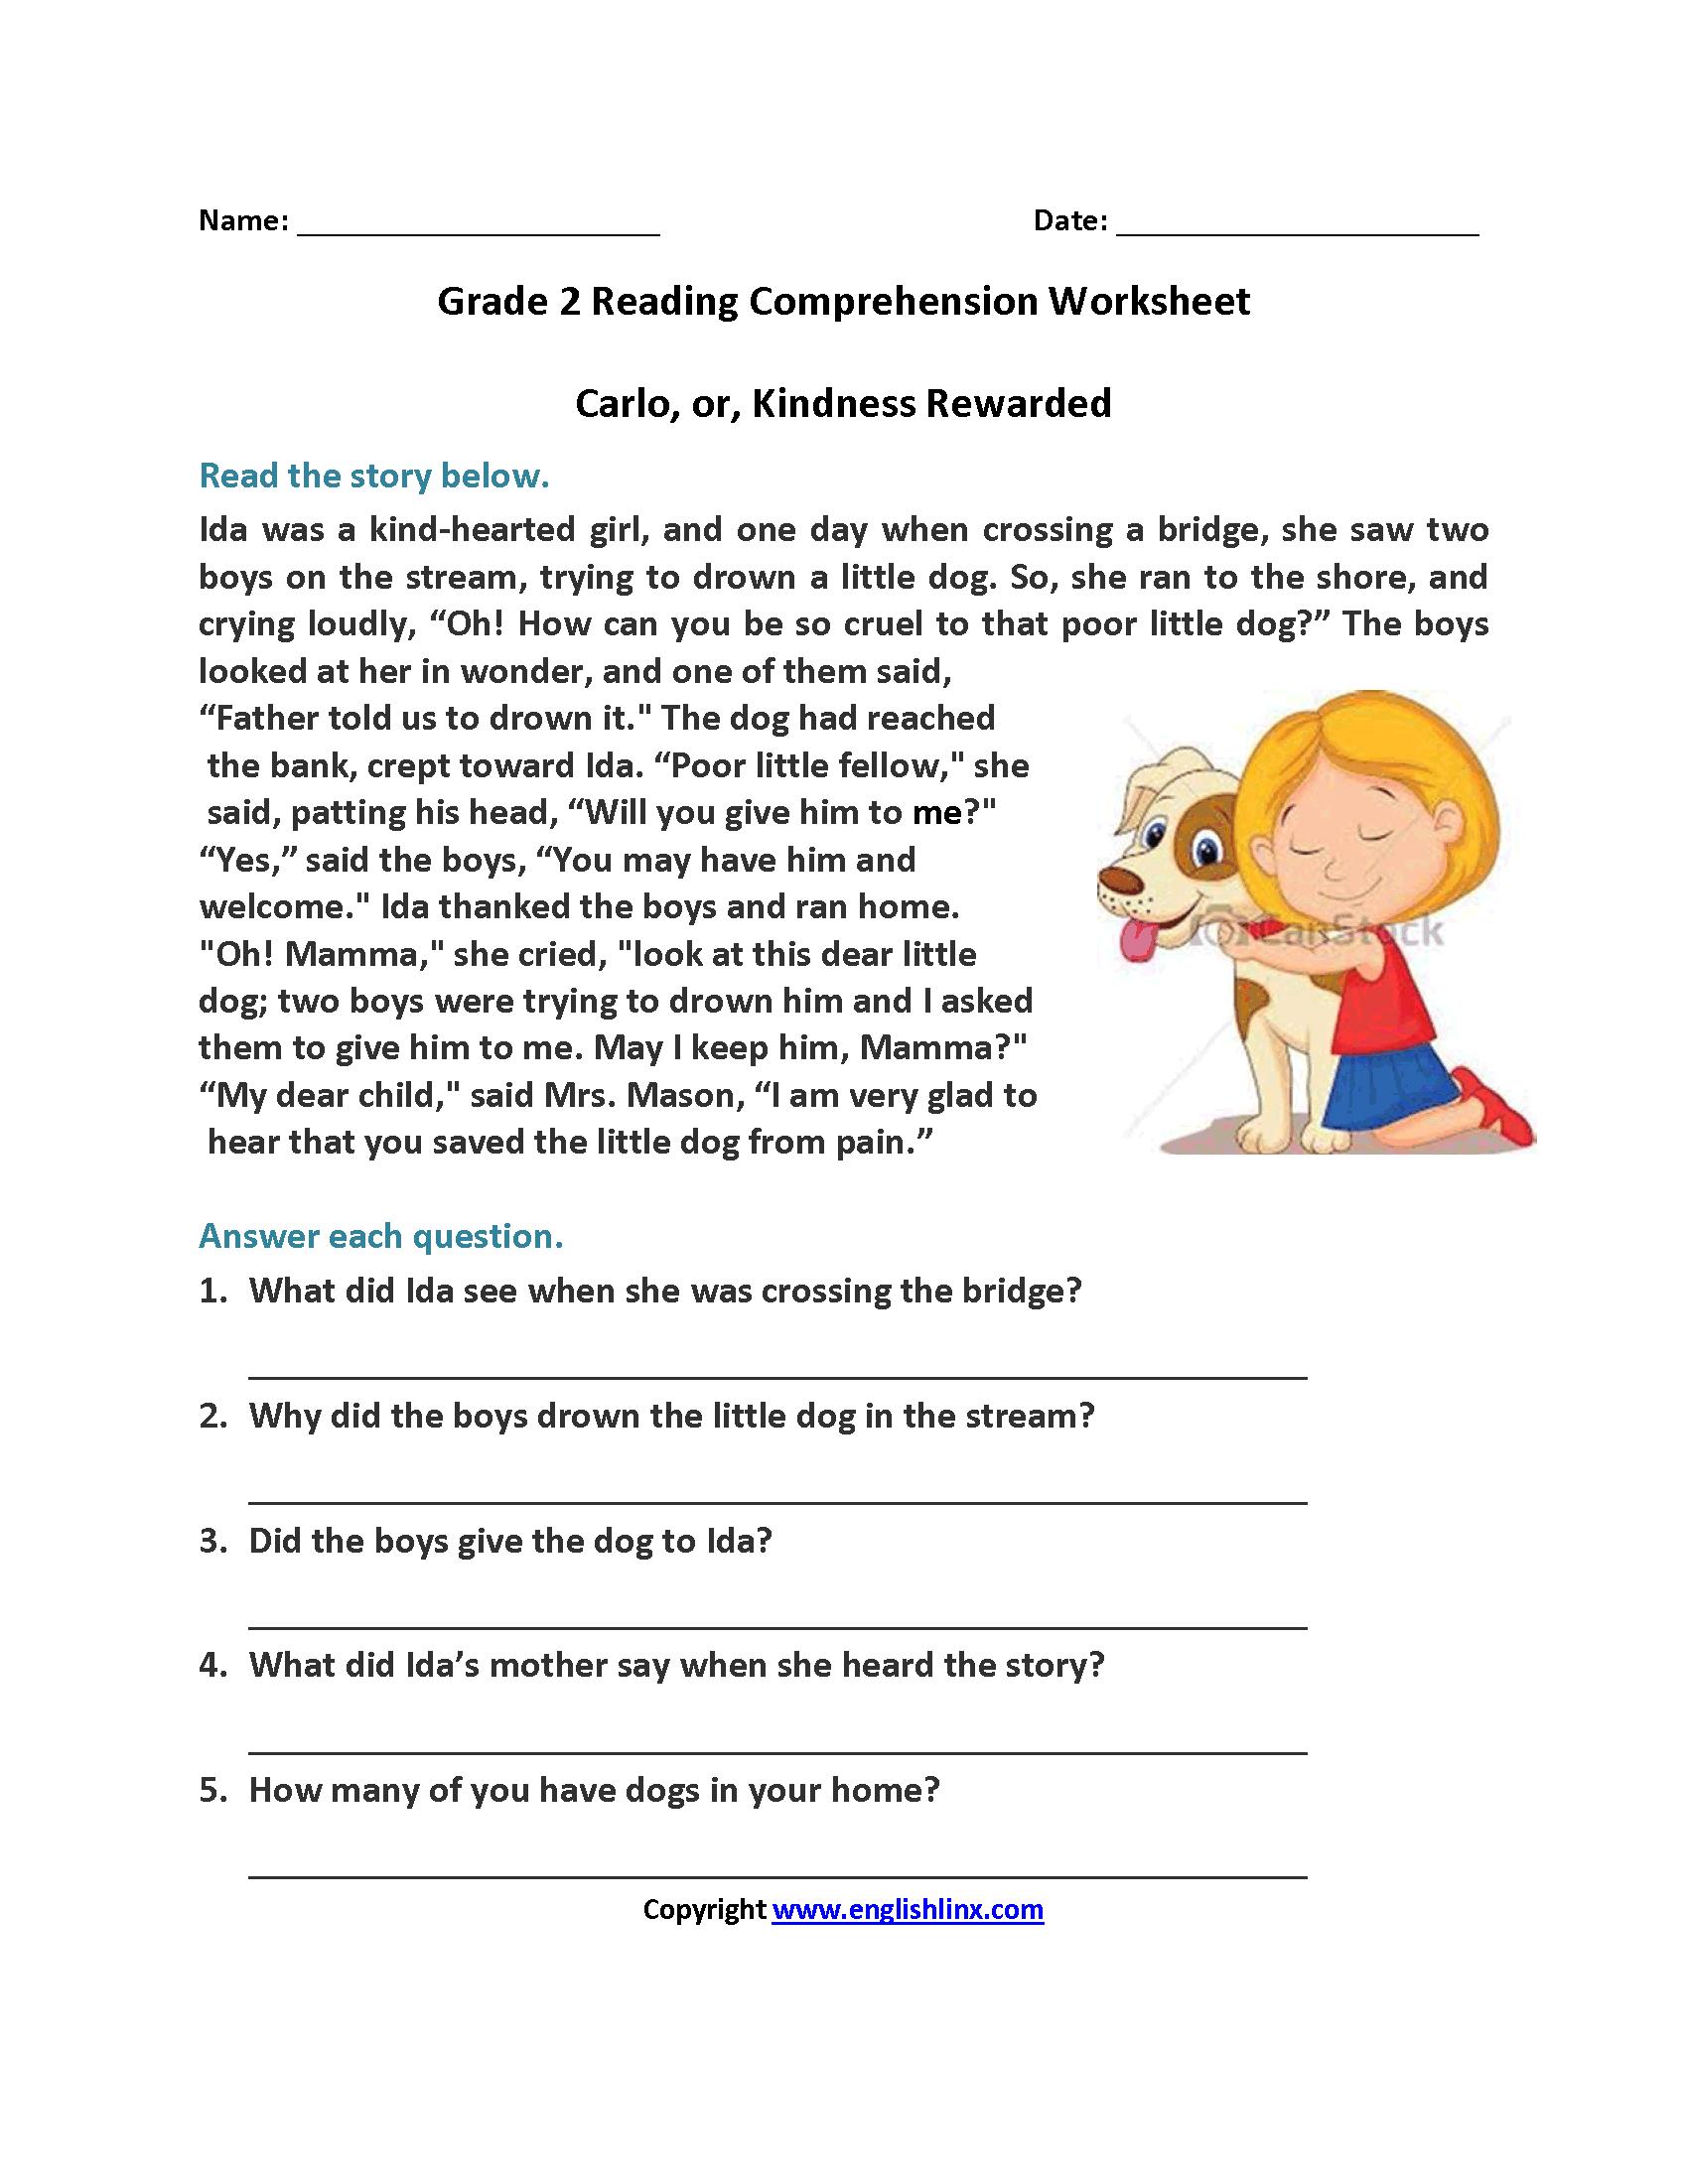 Carlo or Kindness Rewarded Second Grade Reading Worksh…   2nd grade reading  worksheets [ 2200 x 1700 Pixel ]